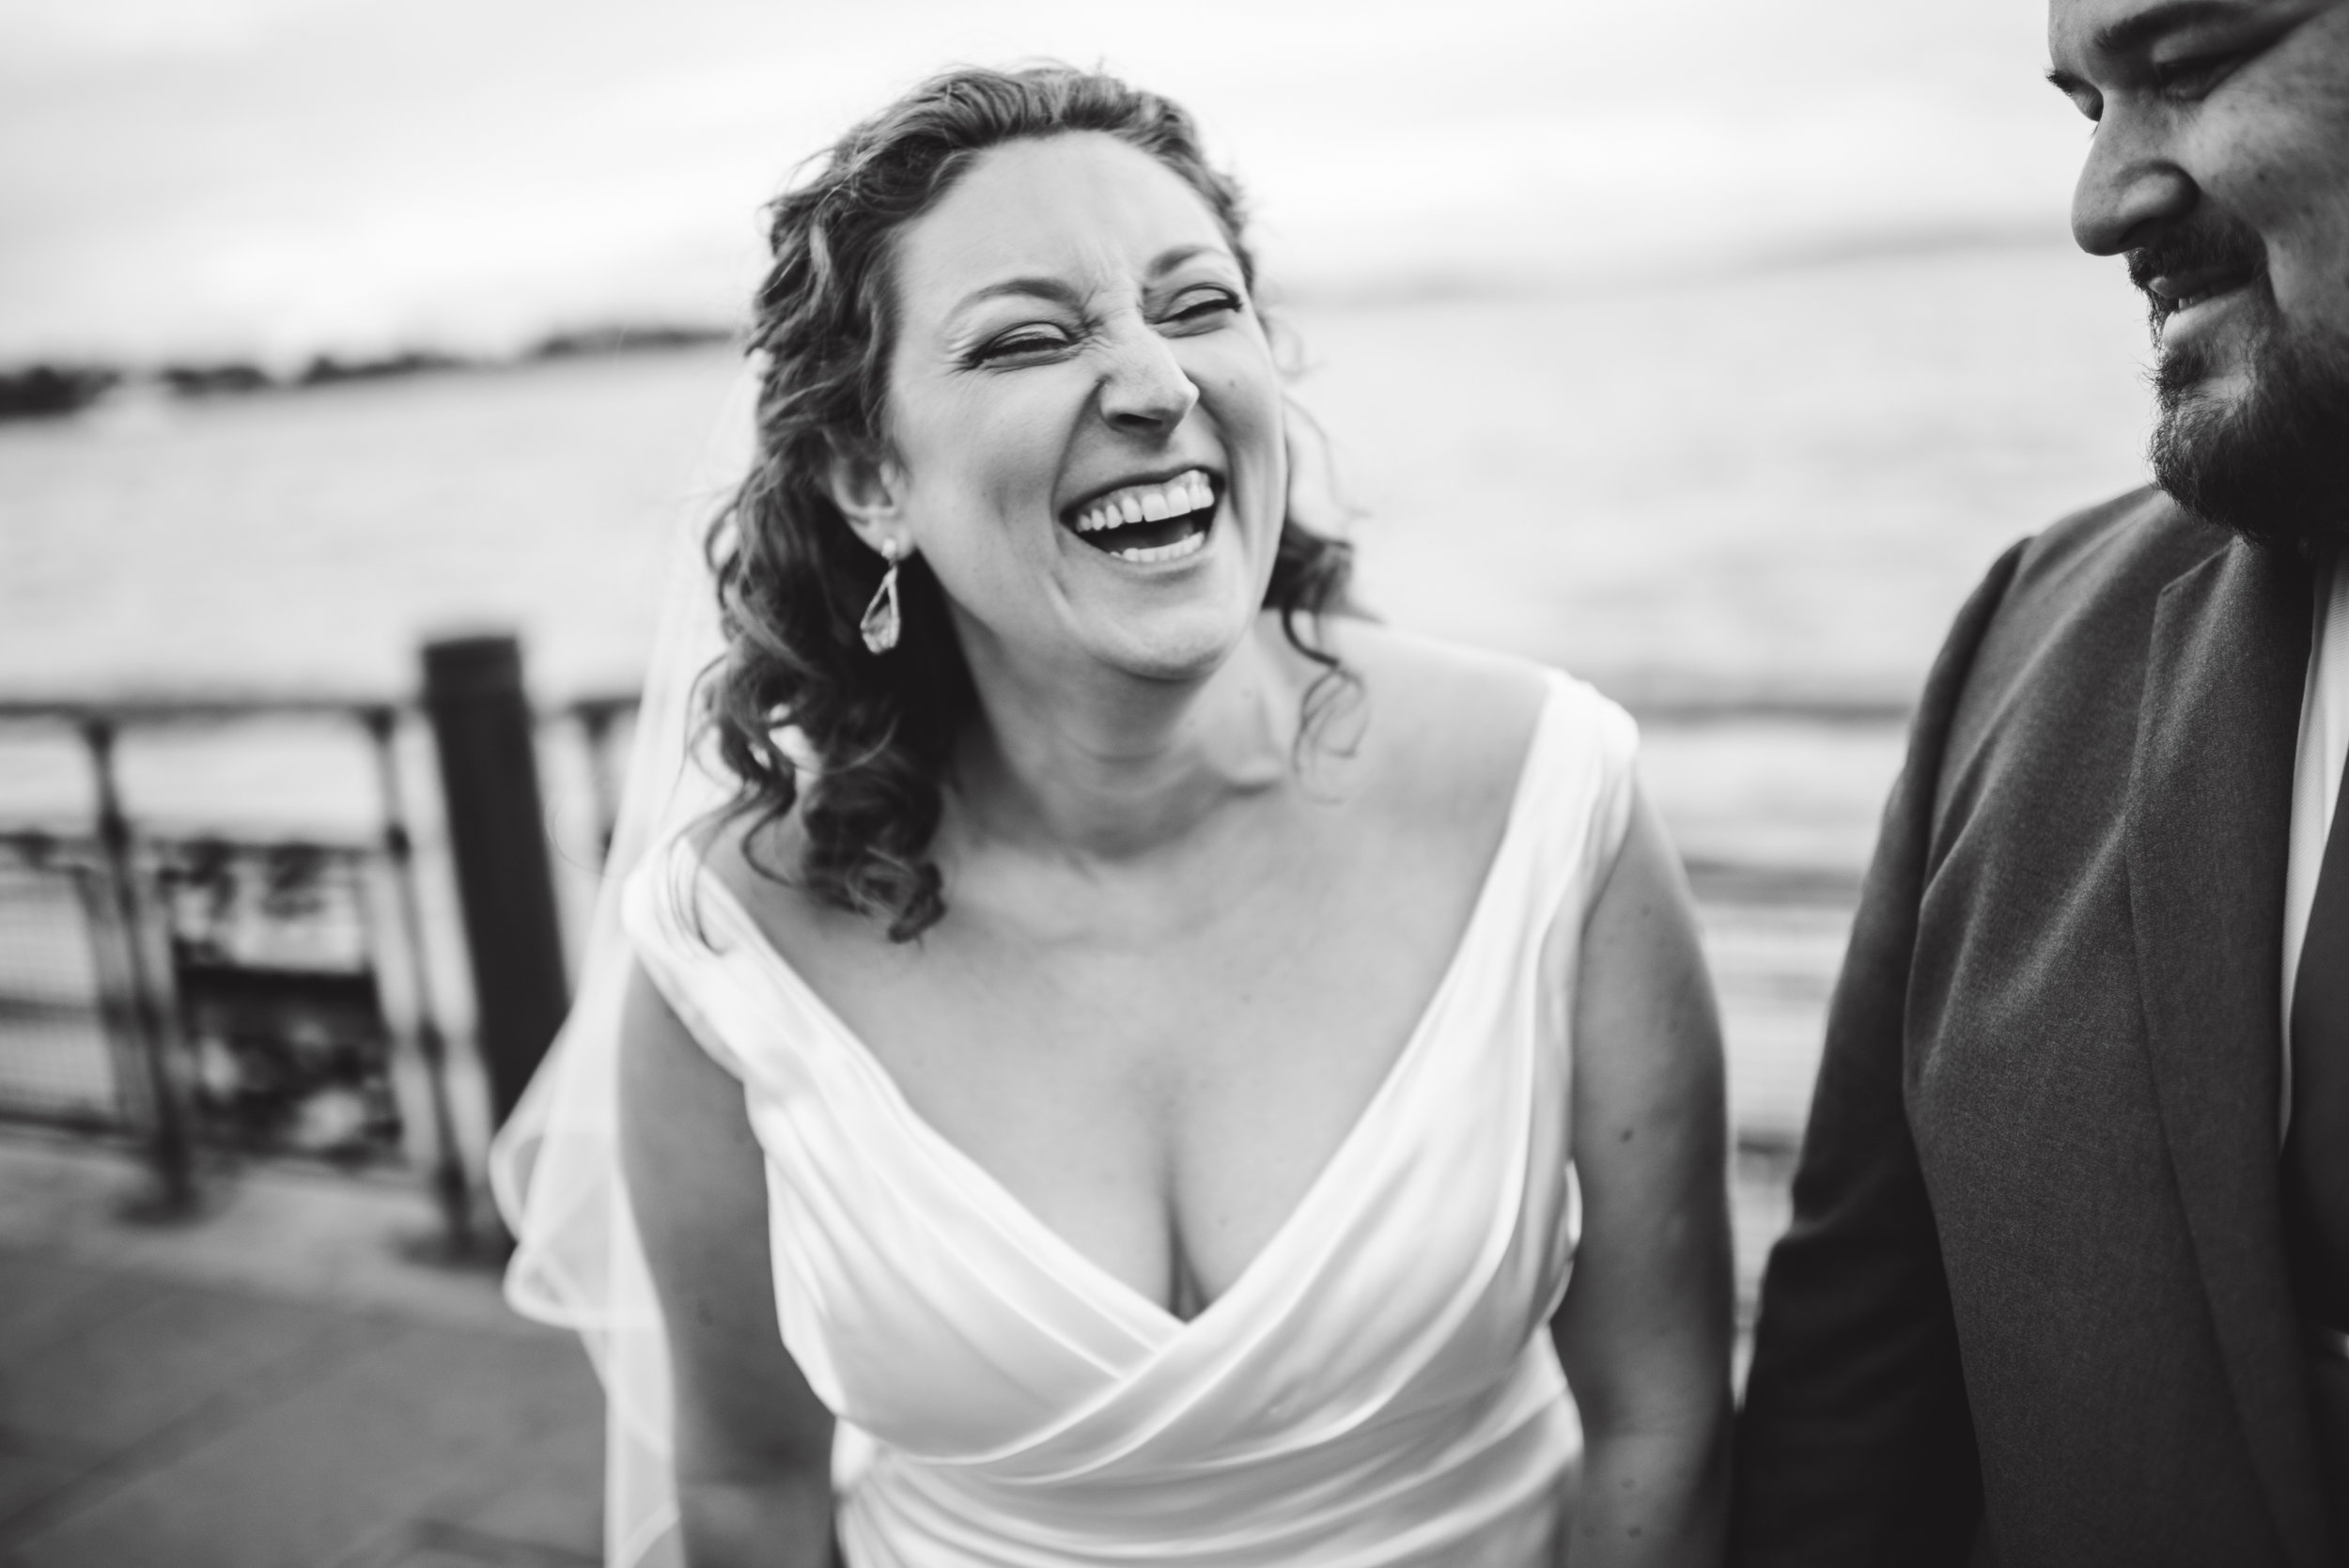 LIZA & JON - BATTERY PARK WEDDING - NYC INTIMATE WEDDING PHOTOGRAPHER - CHI-CHI AGBIM-576.jpg